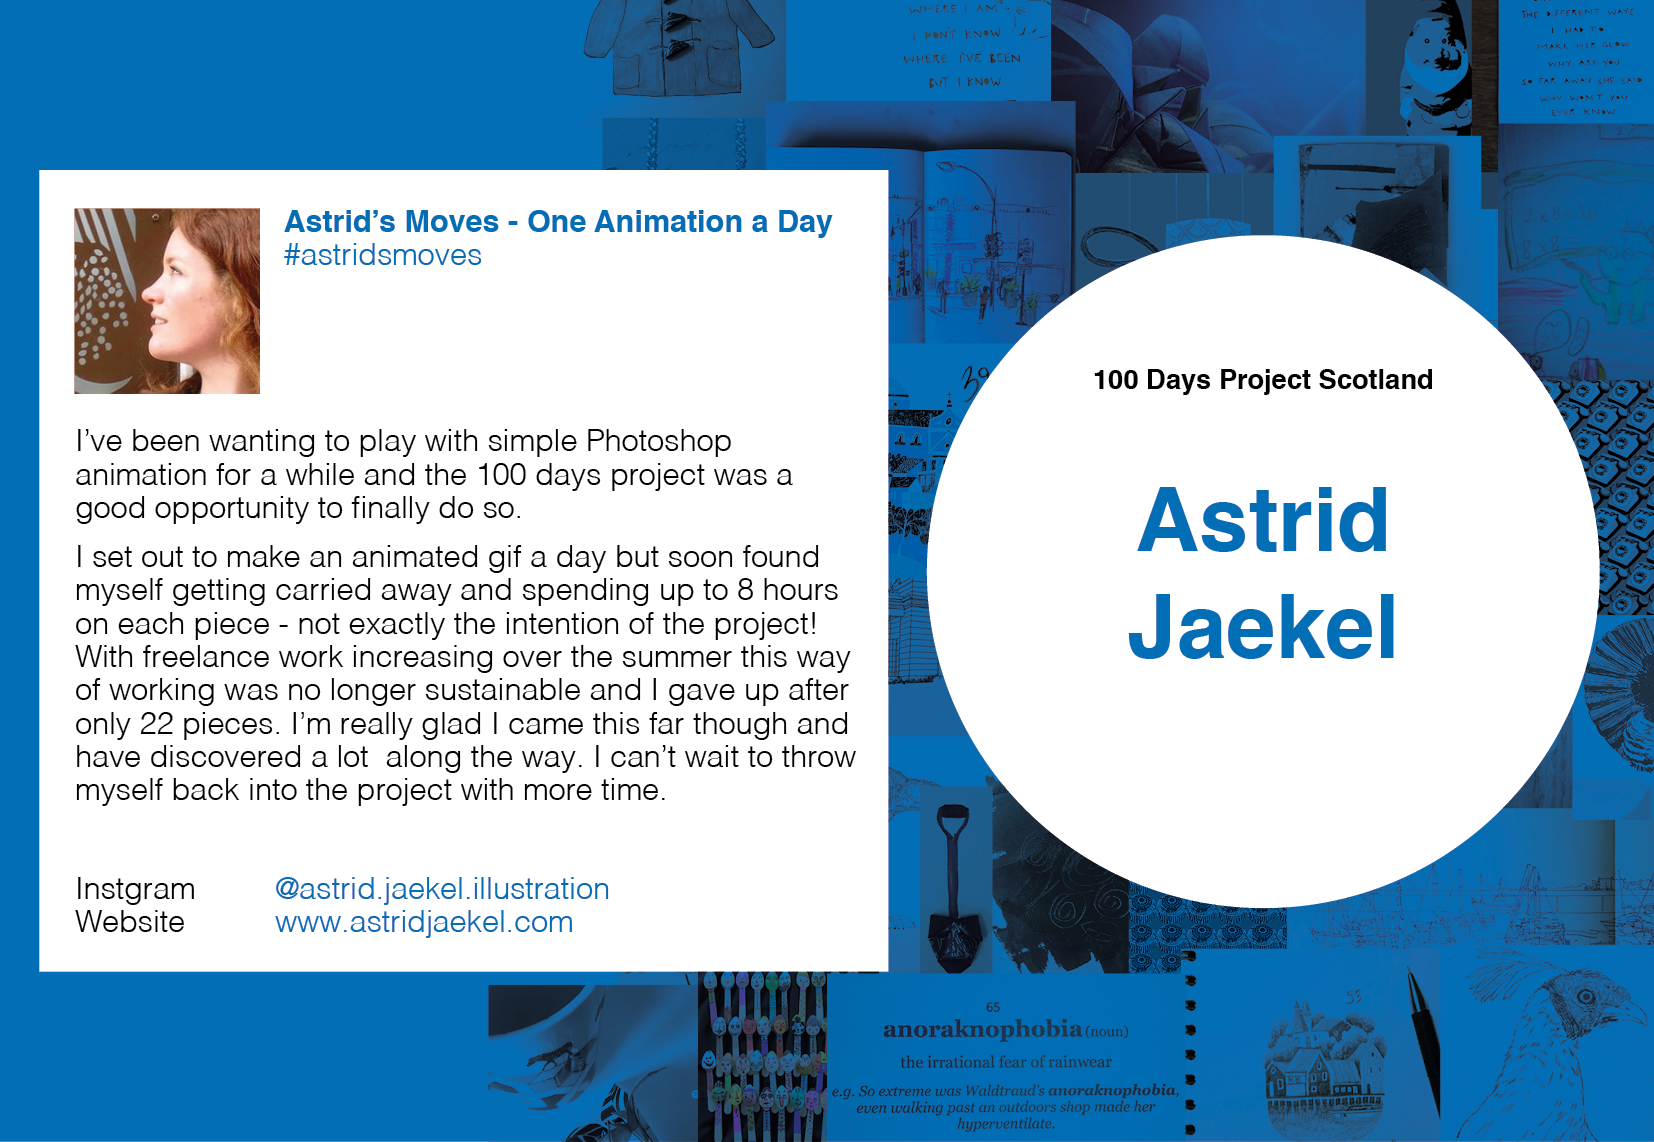 Astrid Jaekel